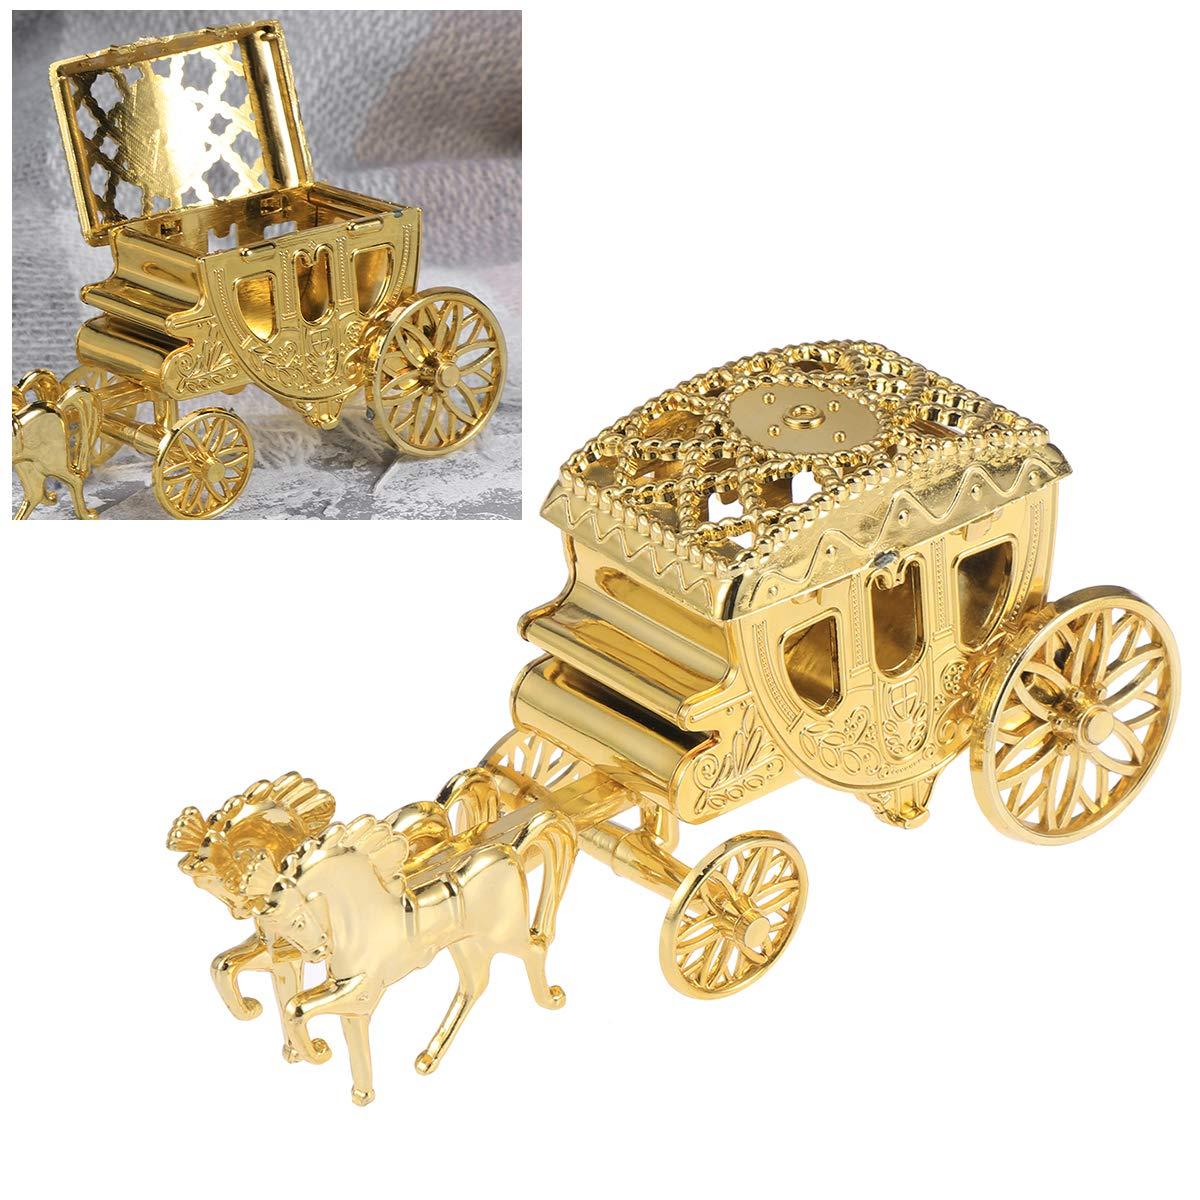 Oro YeahiBaby Wedding Carriage Favor Candy Gift Box Chocolate Scatola per bomboniera Compleanno Festa Nuziale Doccia